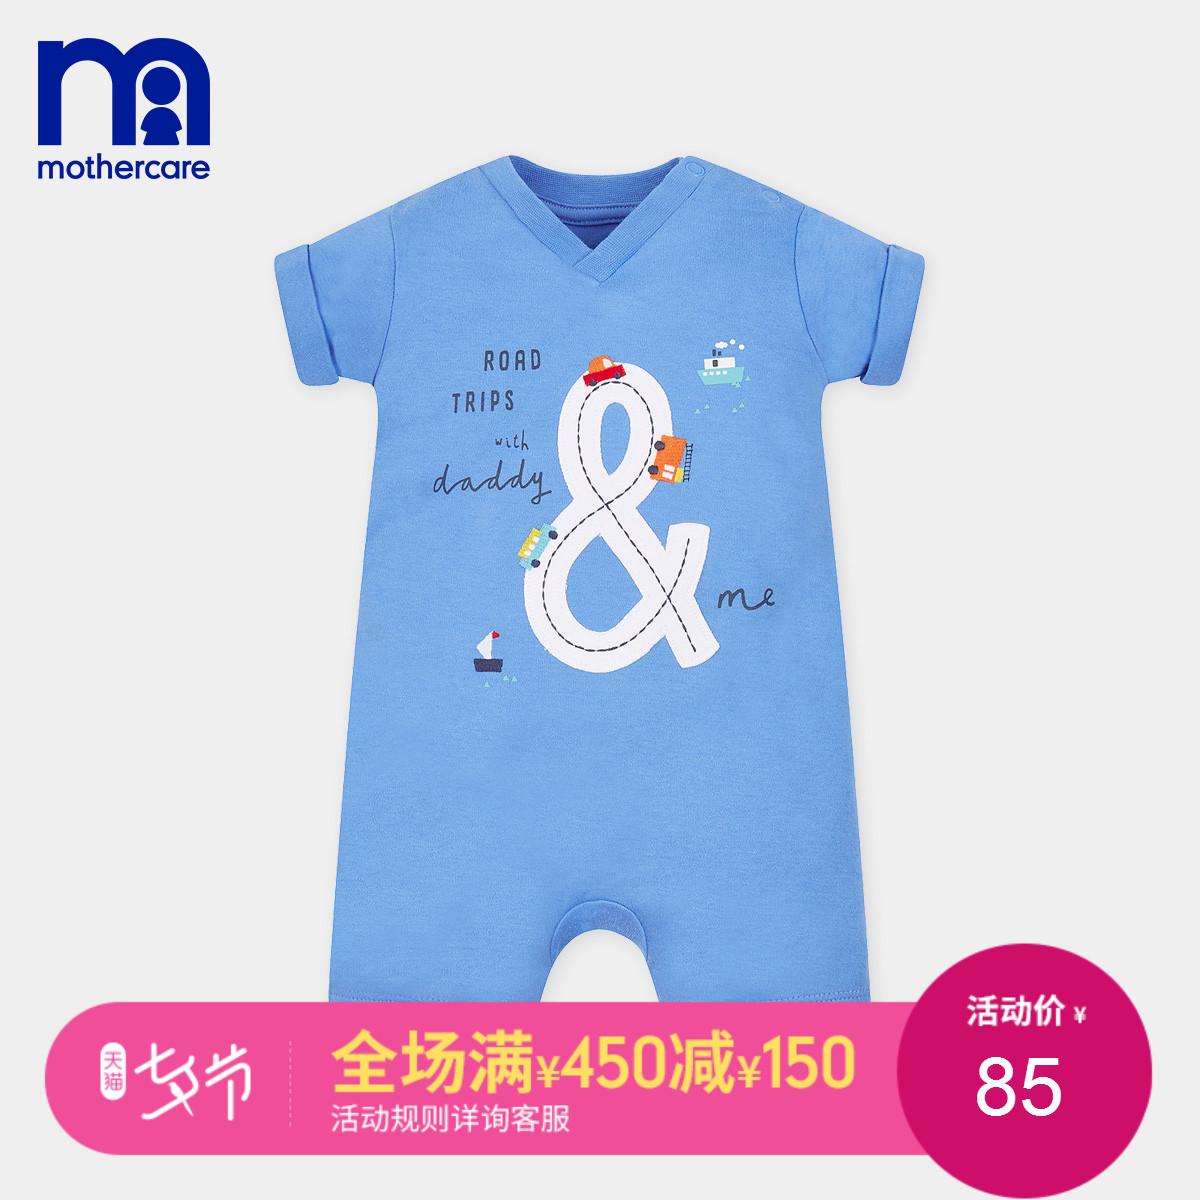 mothercare男婴儿连体衣2018夏装短袖棉质新生儿宝宝衣服哈衣夏季